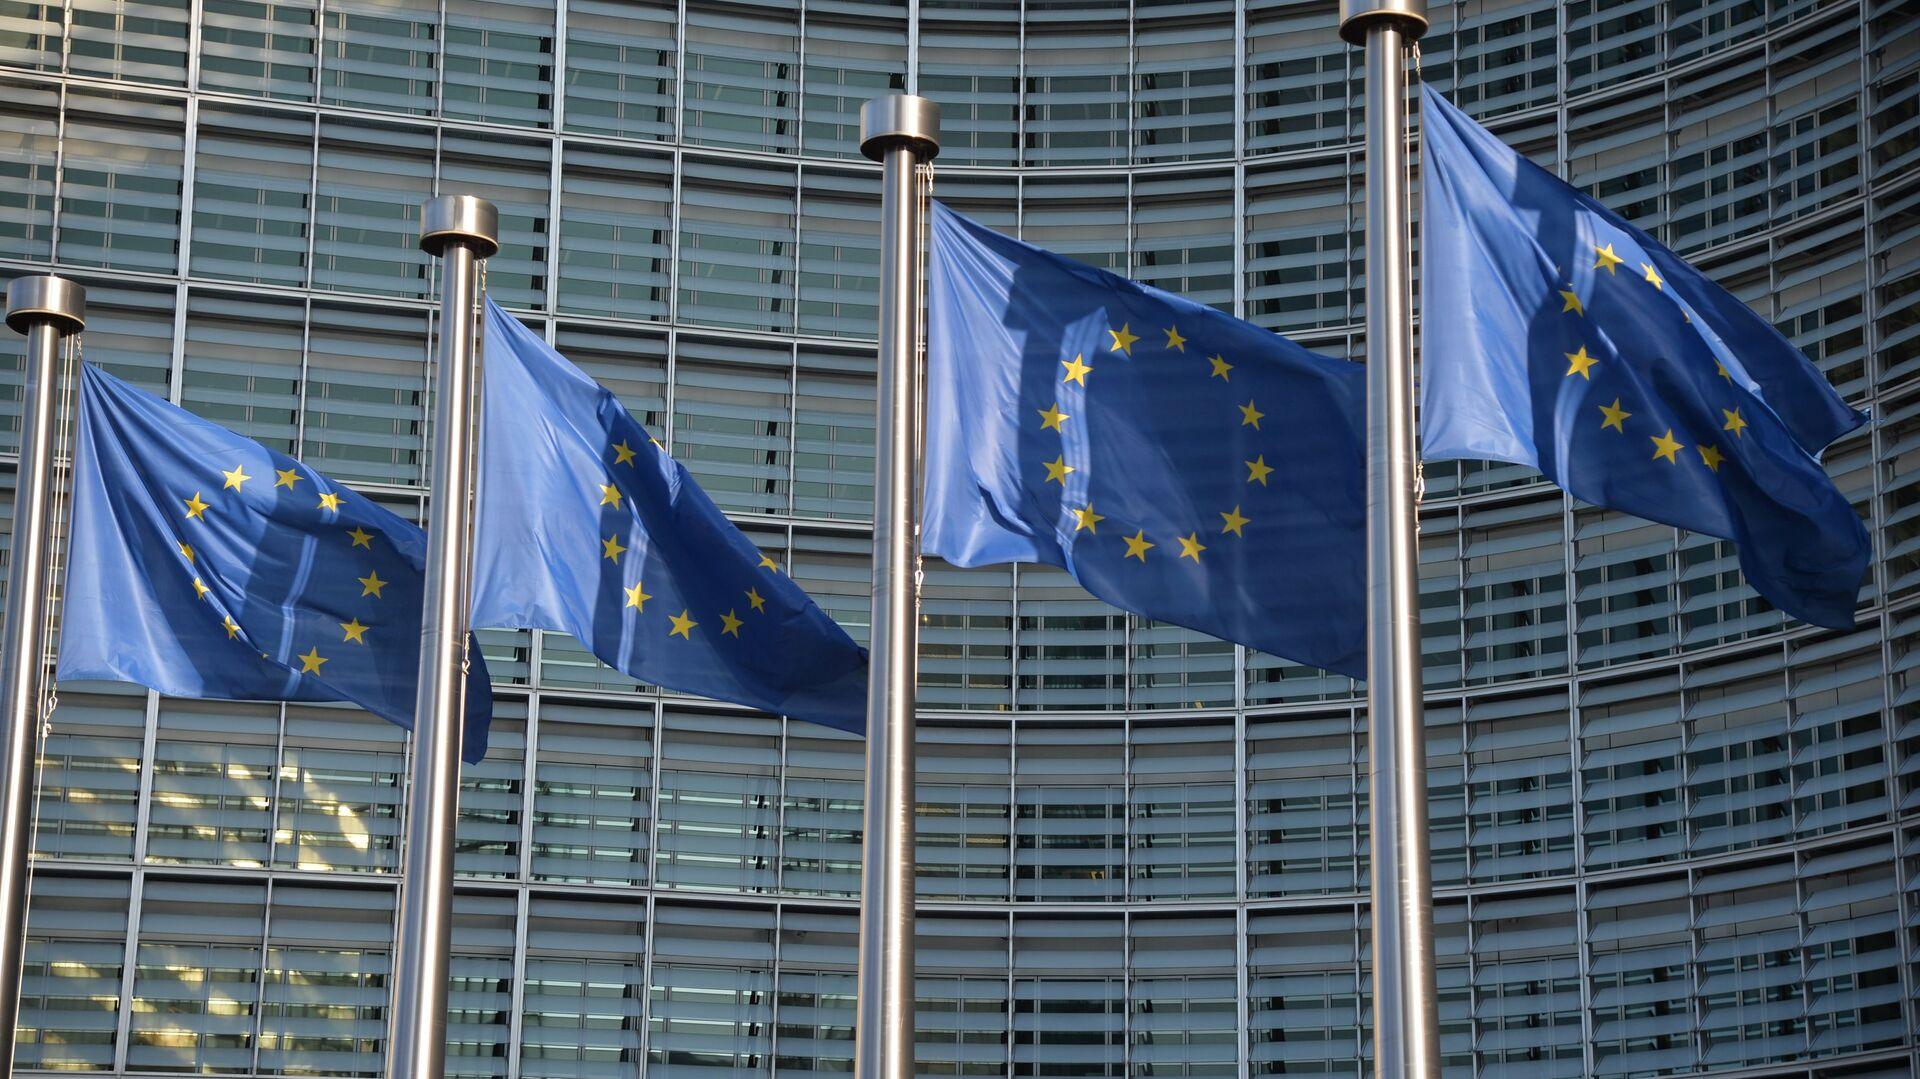 Flagi UE w Brukseli - Sputnik Polska, 1920, 06.10.2021